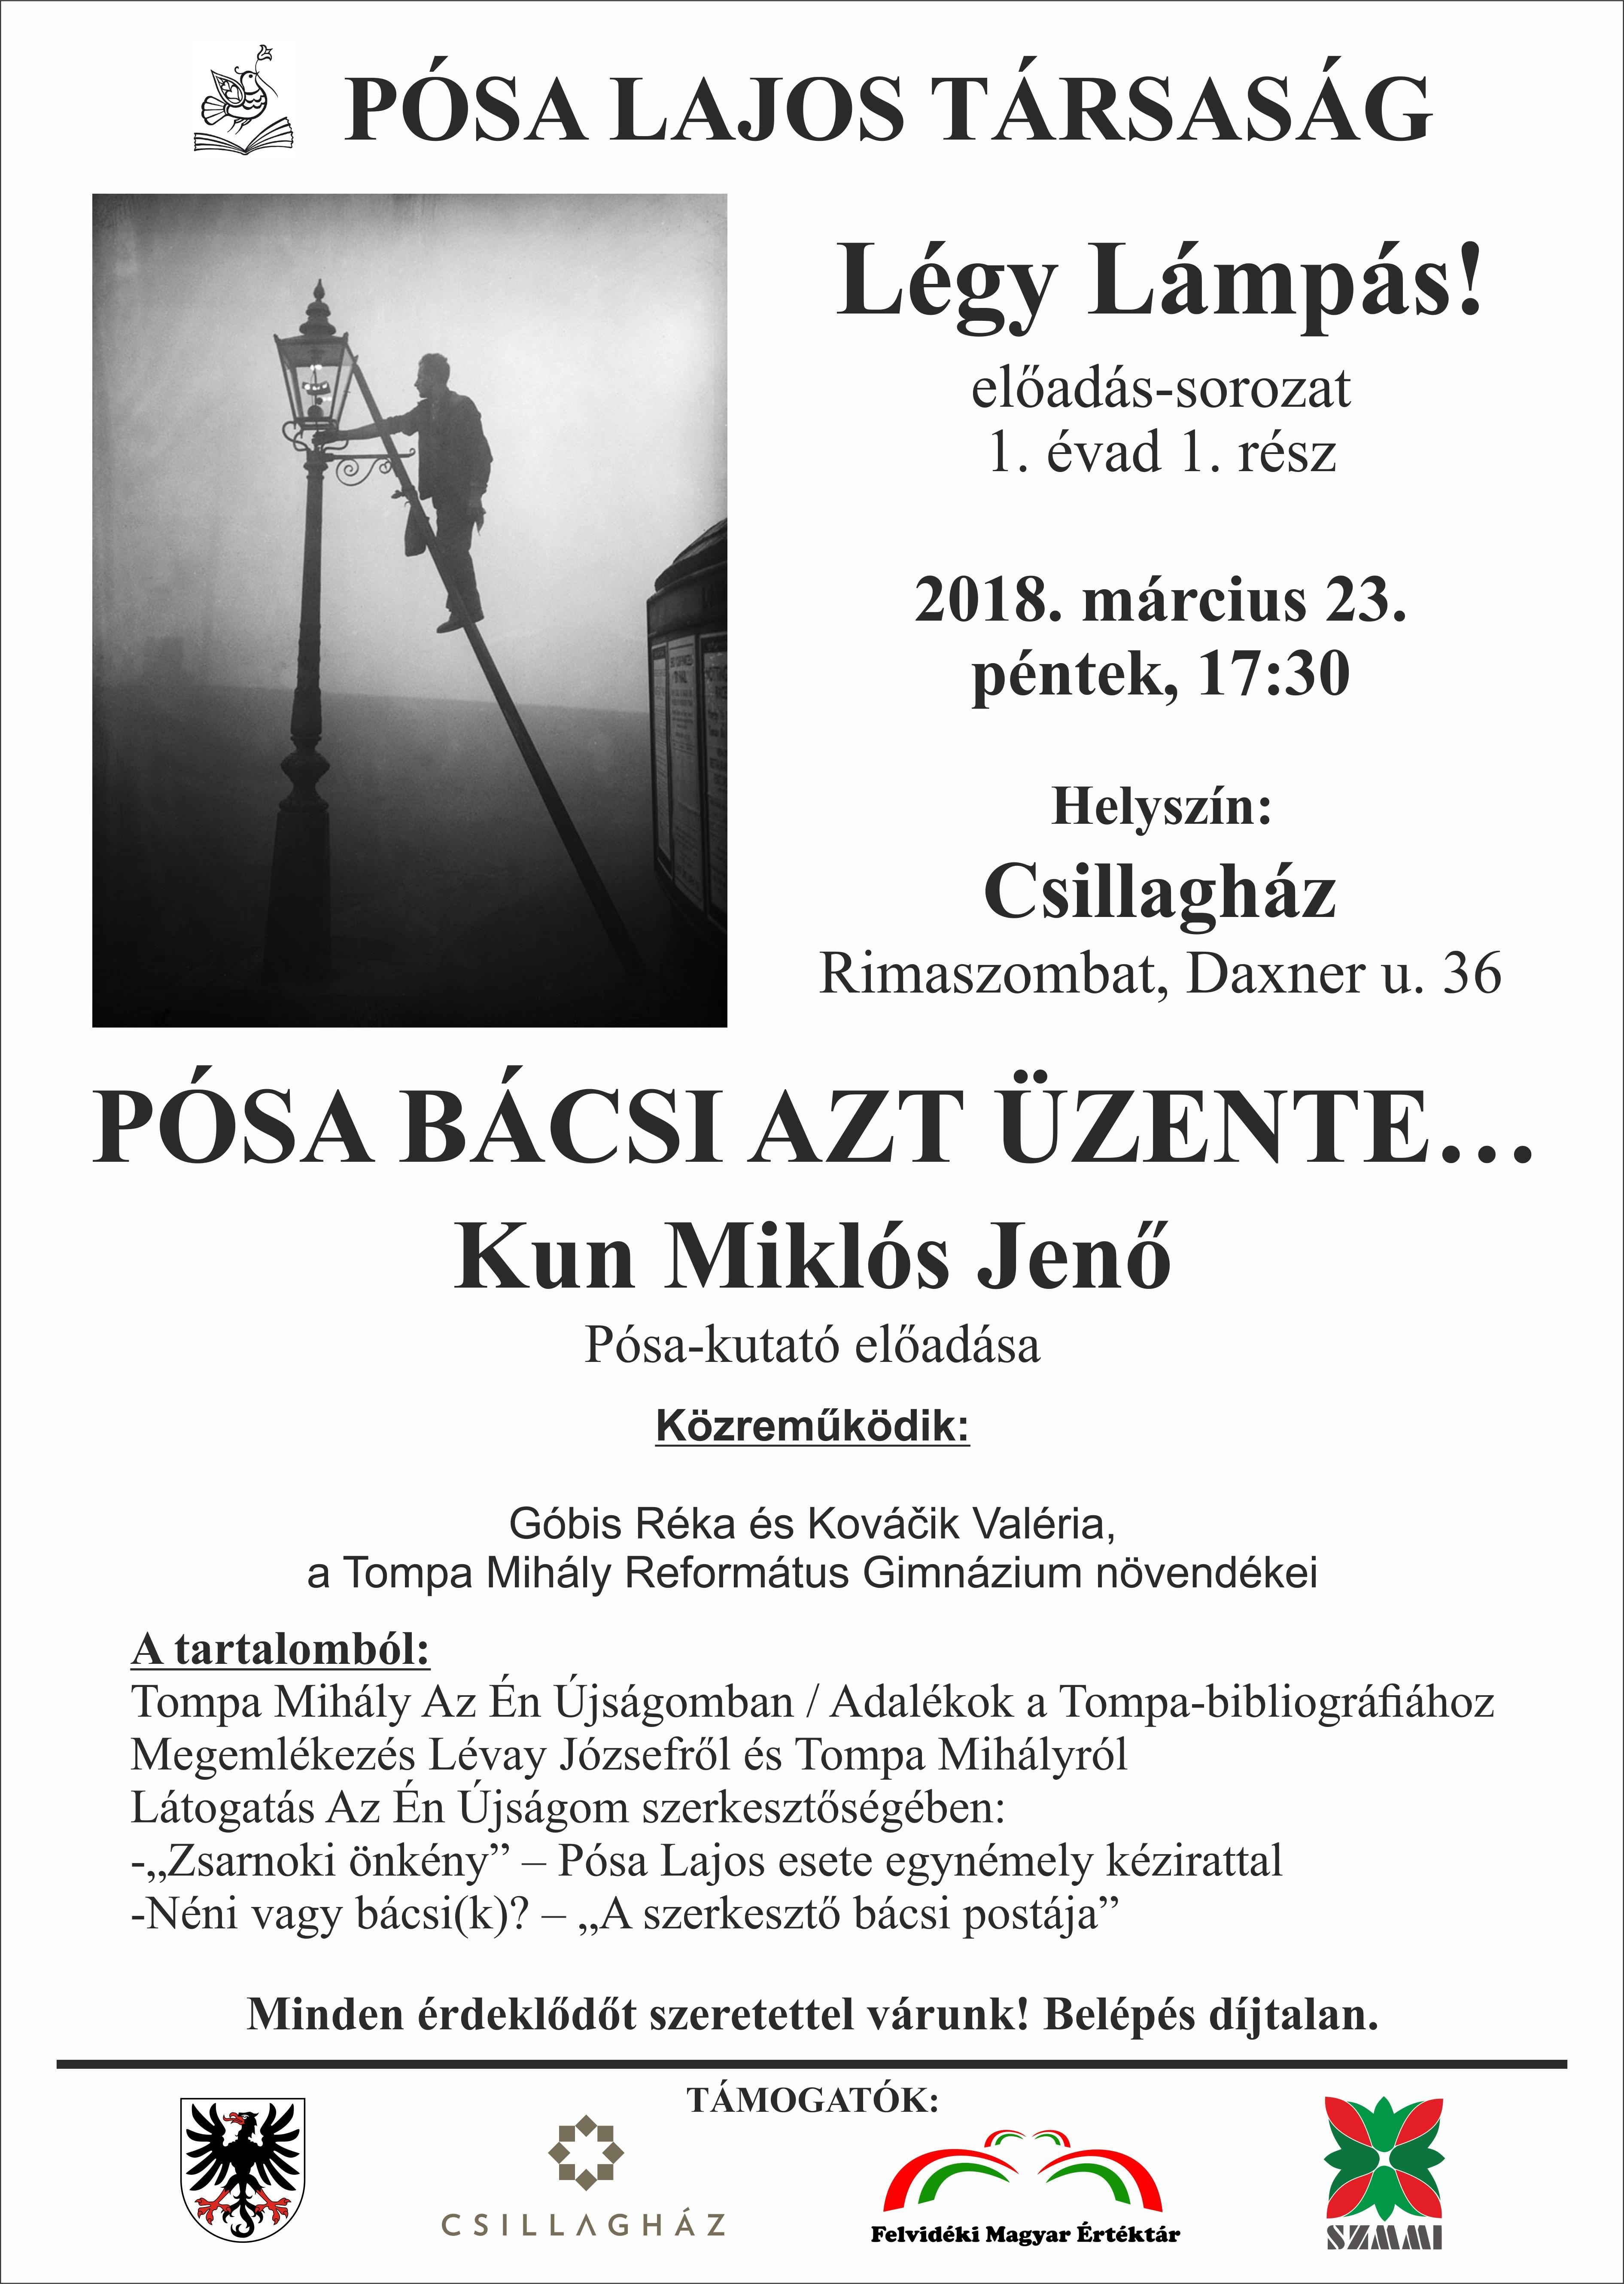 Kun Miklós Jenő : Pósa bácsi azt üzente... c. előadása/ Prednáška v maďarskom jazyku @ Csillagház / Hviezdny dom, Rimavská Sobota, Daxnerova ulica č.36